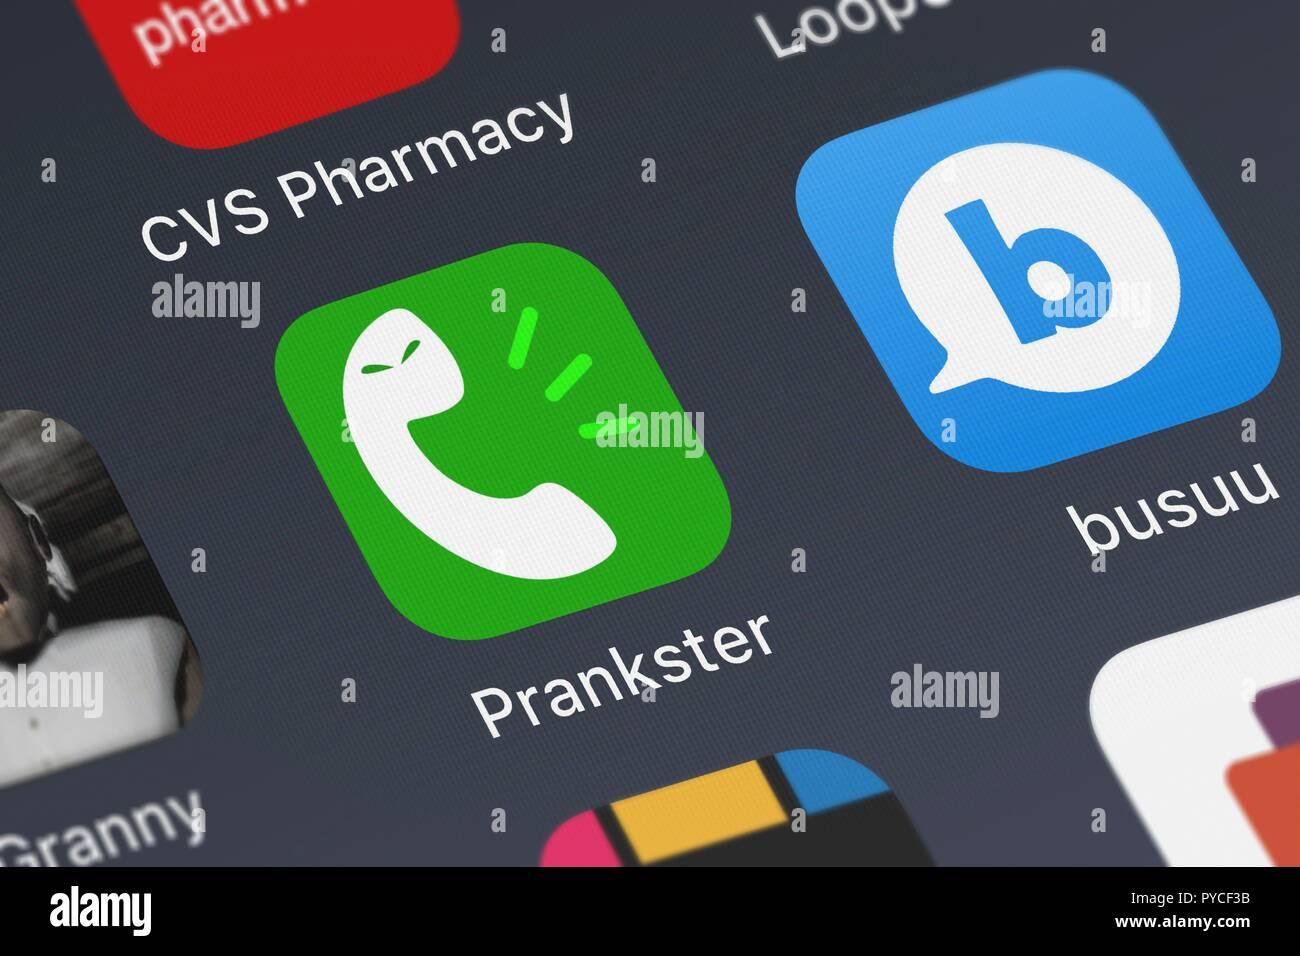 Prank call application   4 Really Popular Prank Call